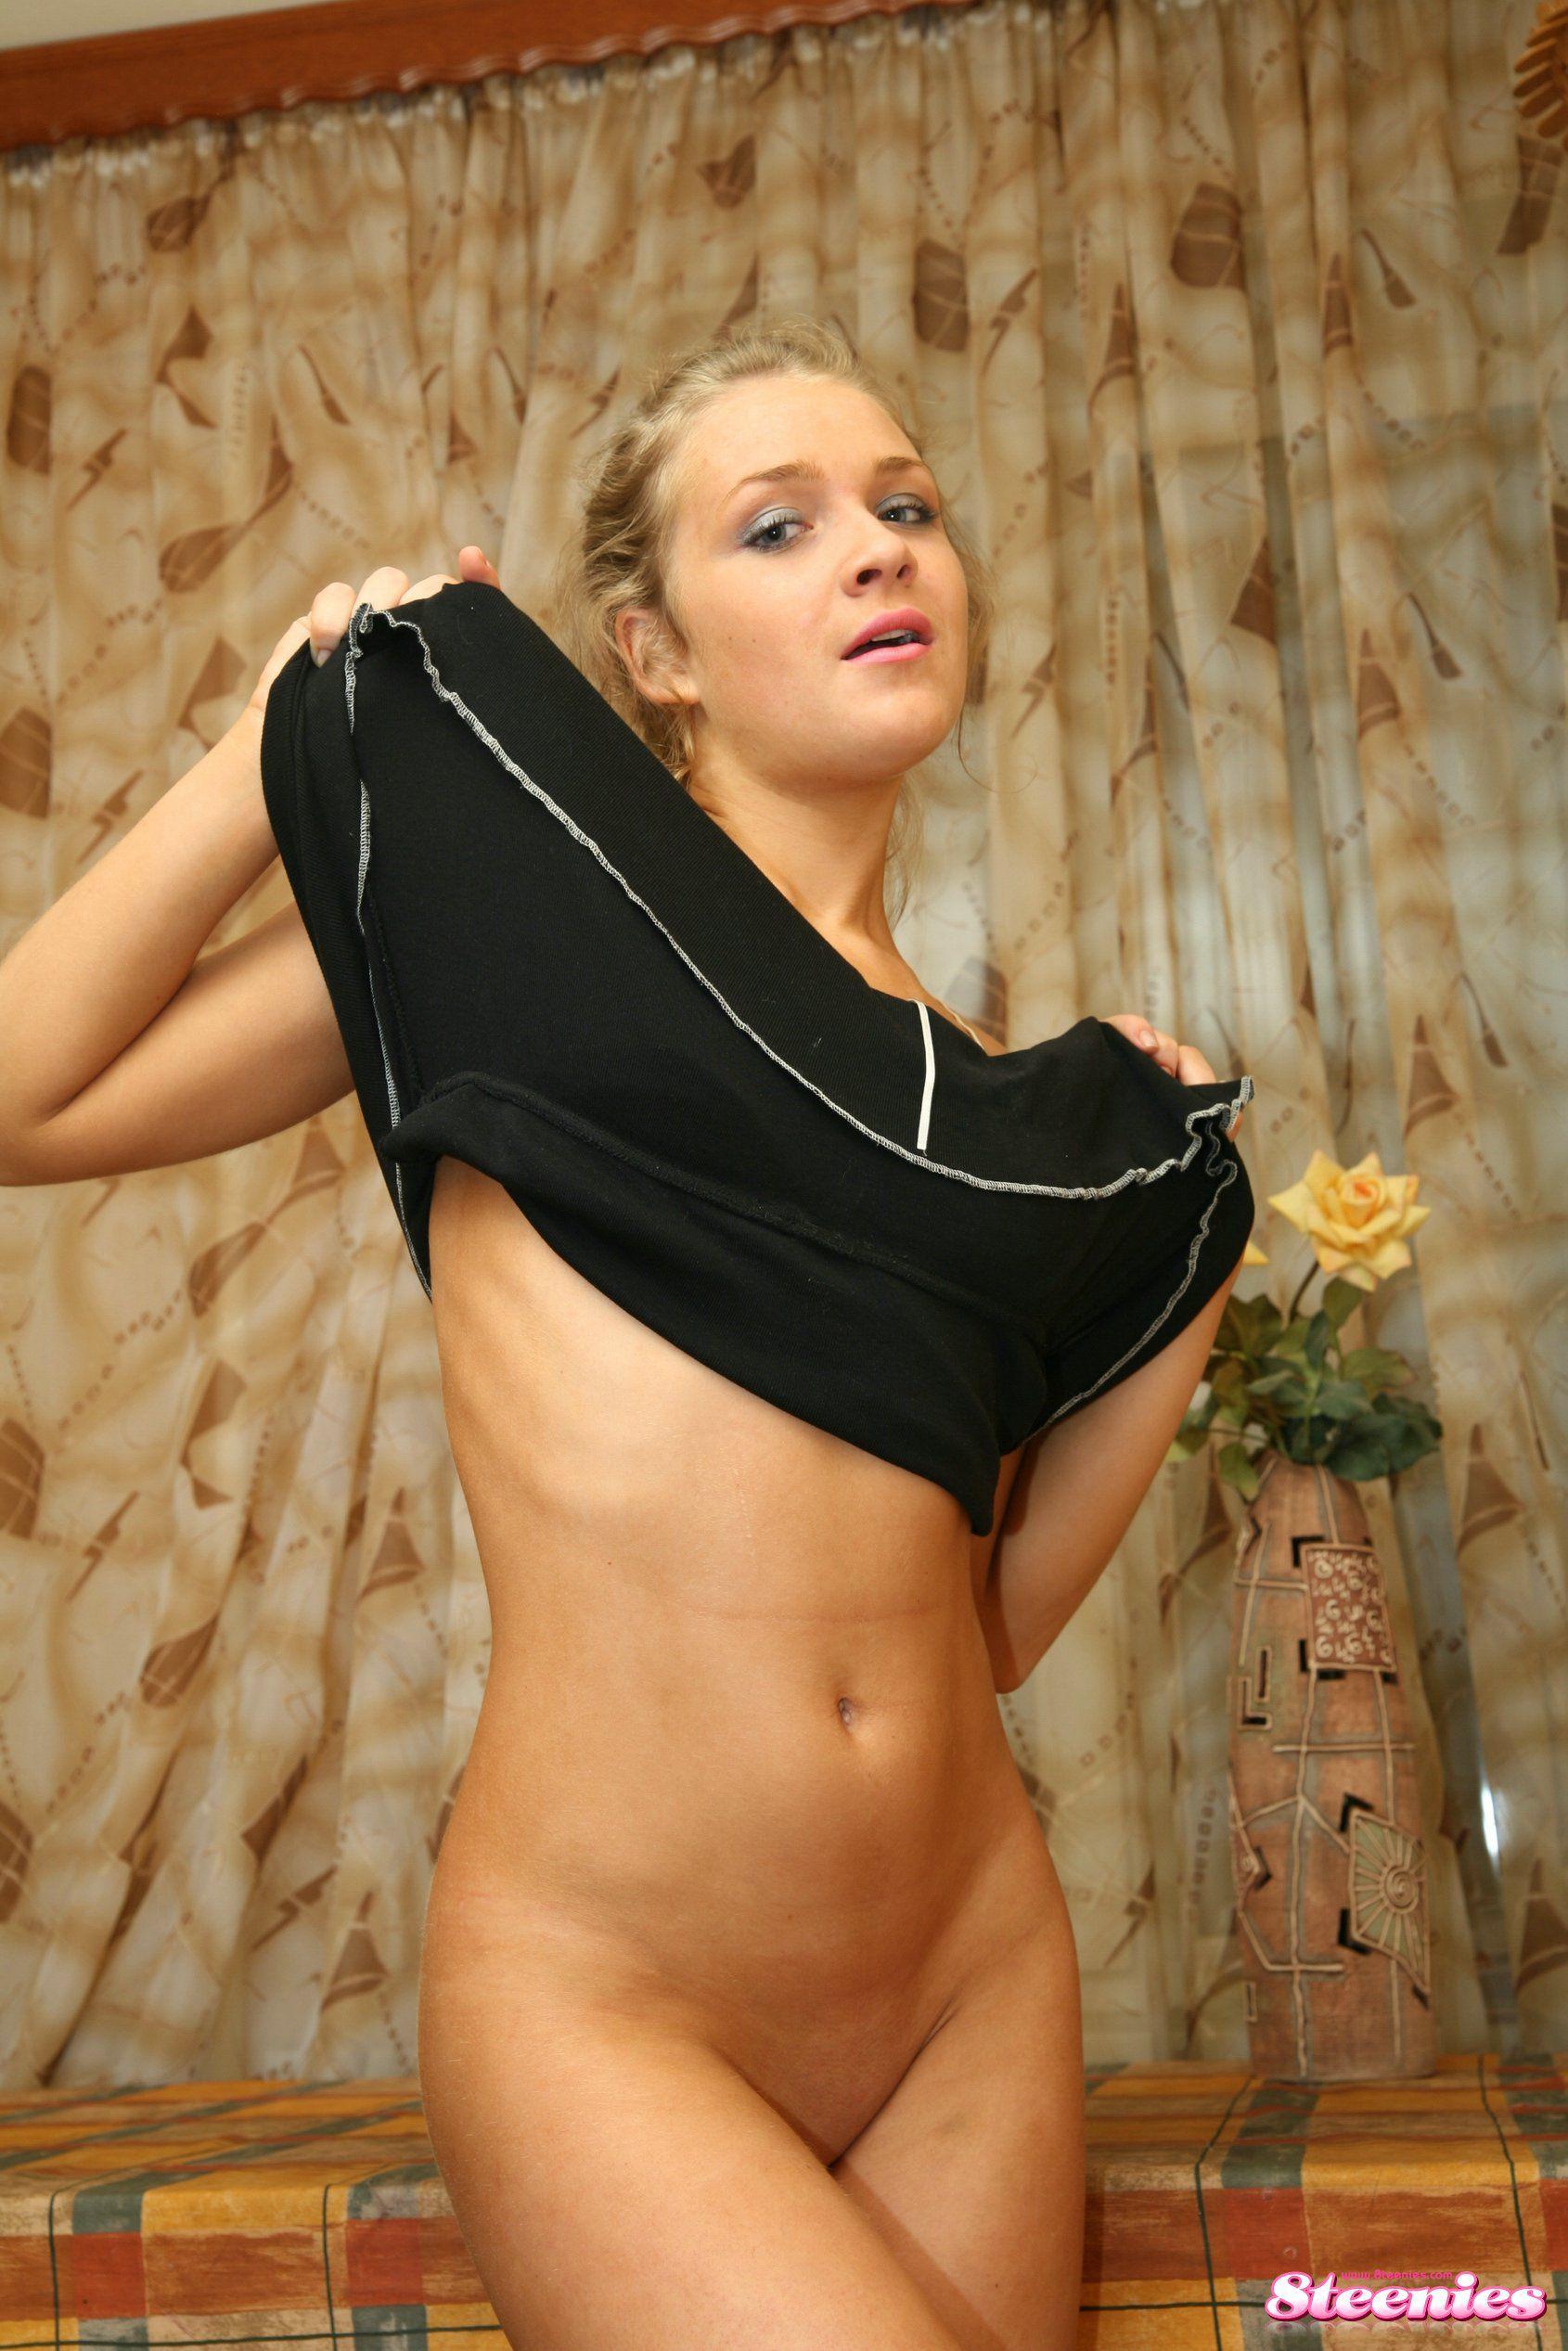 http://i6.imageban.ru/out/2013/11/26/43bff072e5d6cf251e2662a6ebde0180.jpg